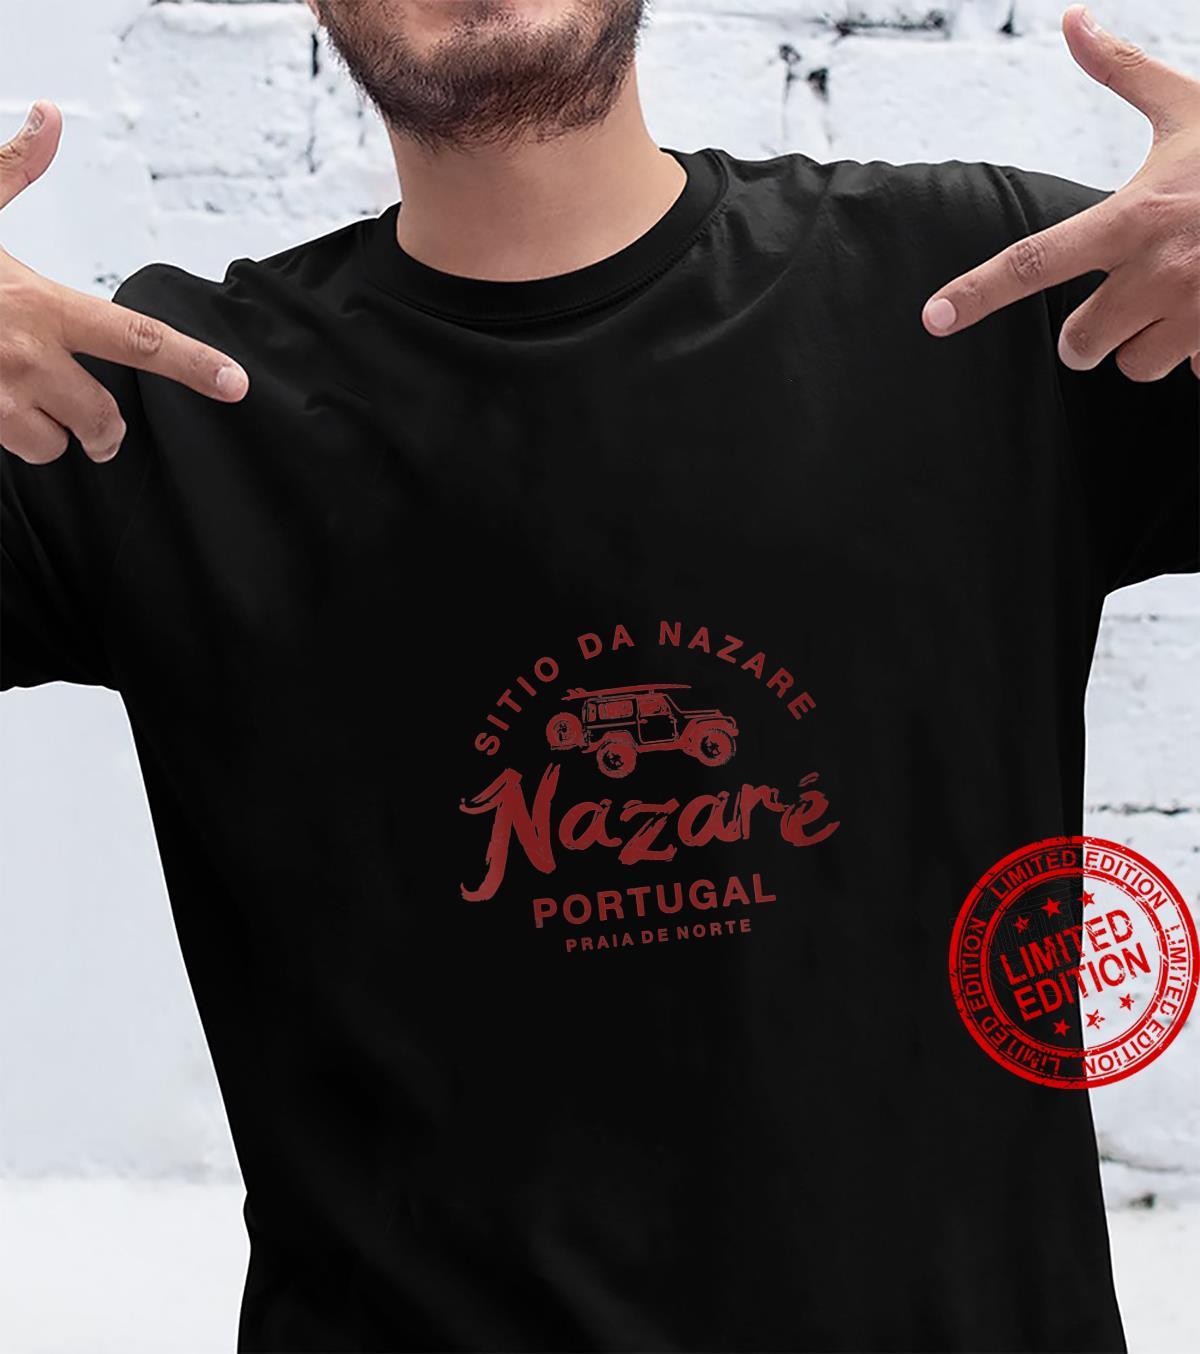 Womens Nazare Portugal Surfing Vintage Retro Shirt